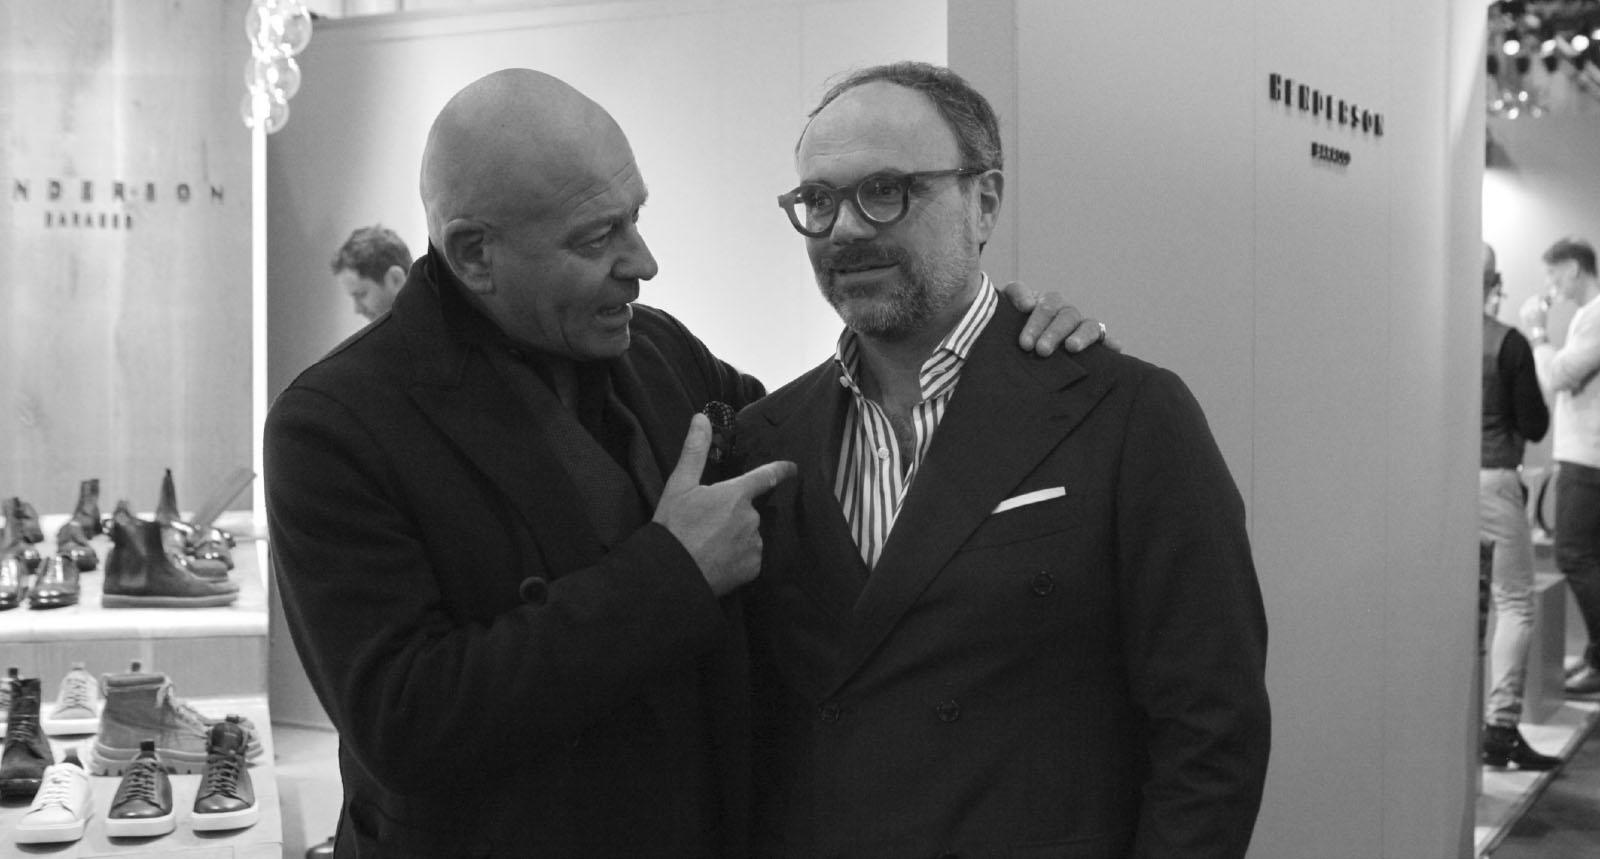 Alberto Del Biondi, Gigi Baracco at PU97